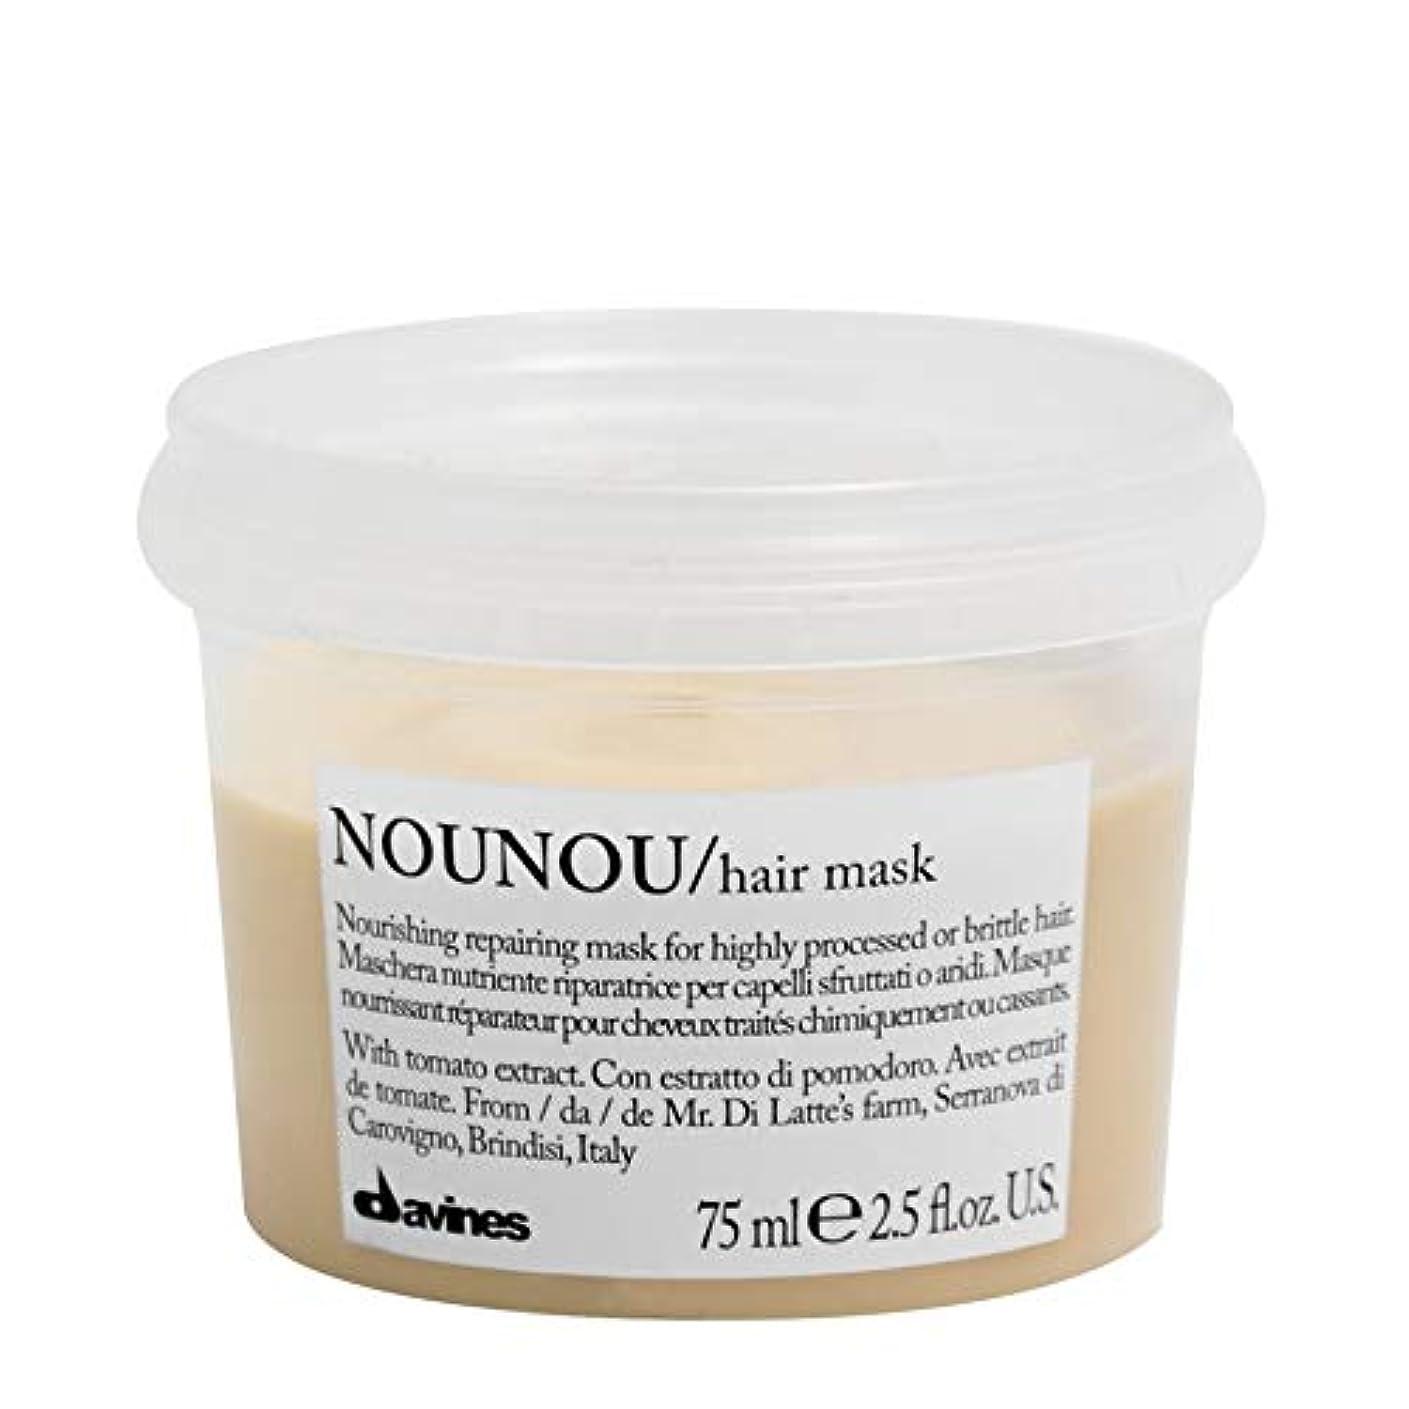 [Davines ] ヘアマスク75ミリリットルノウノウダヴィネス - Davines NouNou Hair Mask 75ml [並行輸入品]